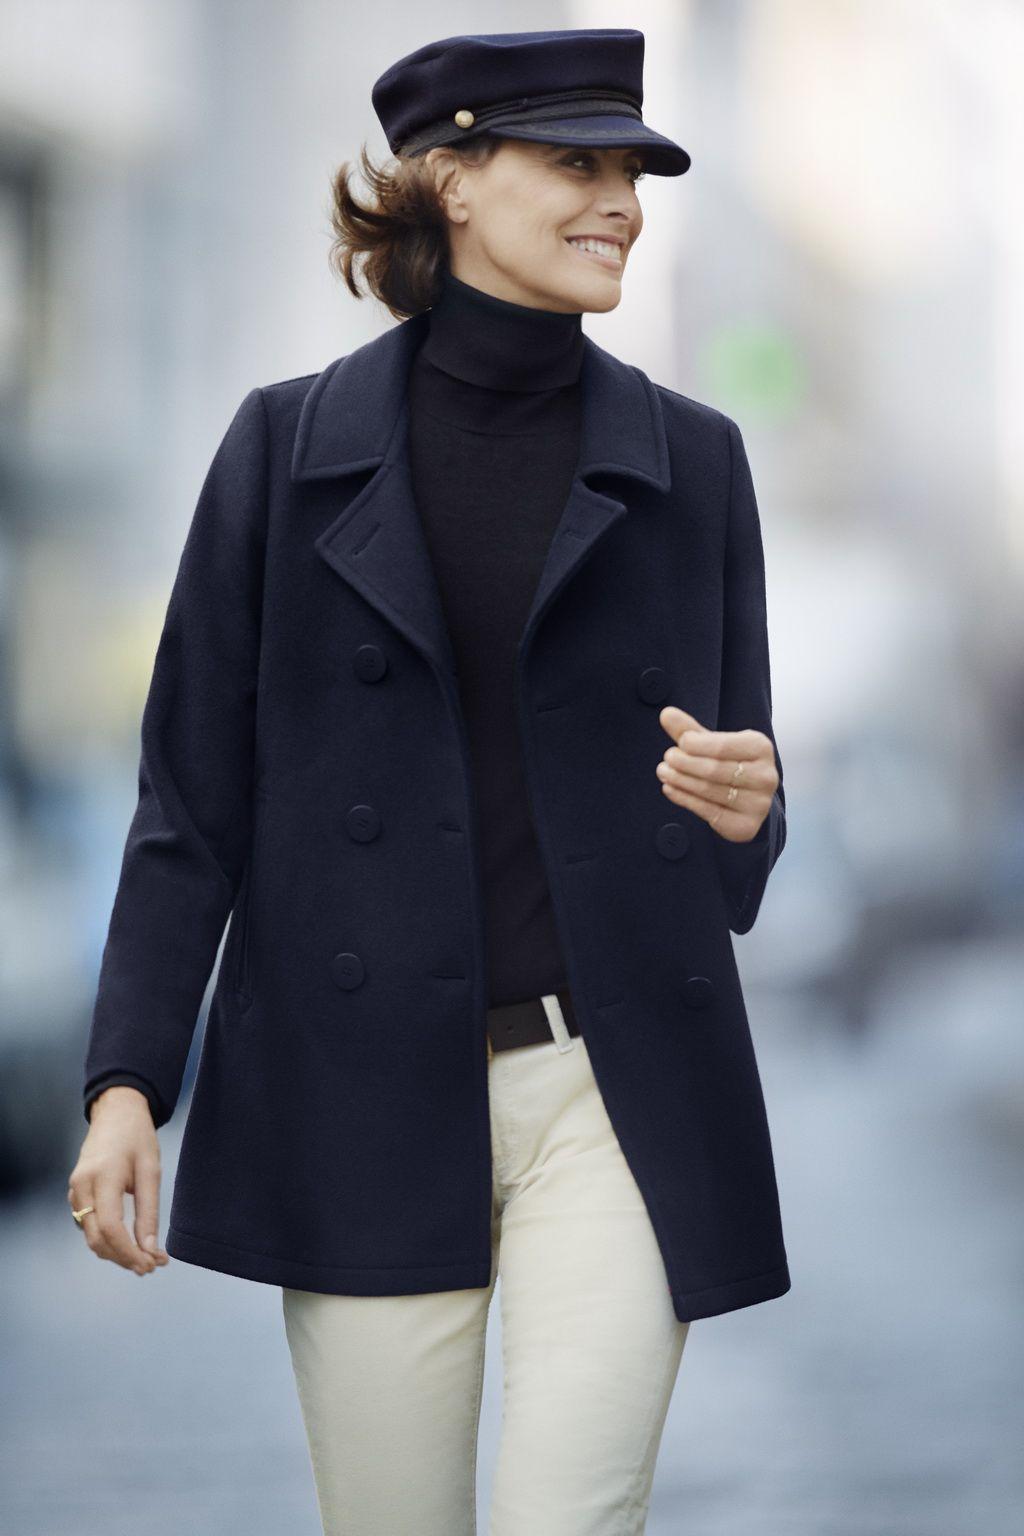 The Best Fashion Blog - Part 7 | Fashion, Parisian style, Fashion over 50